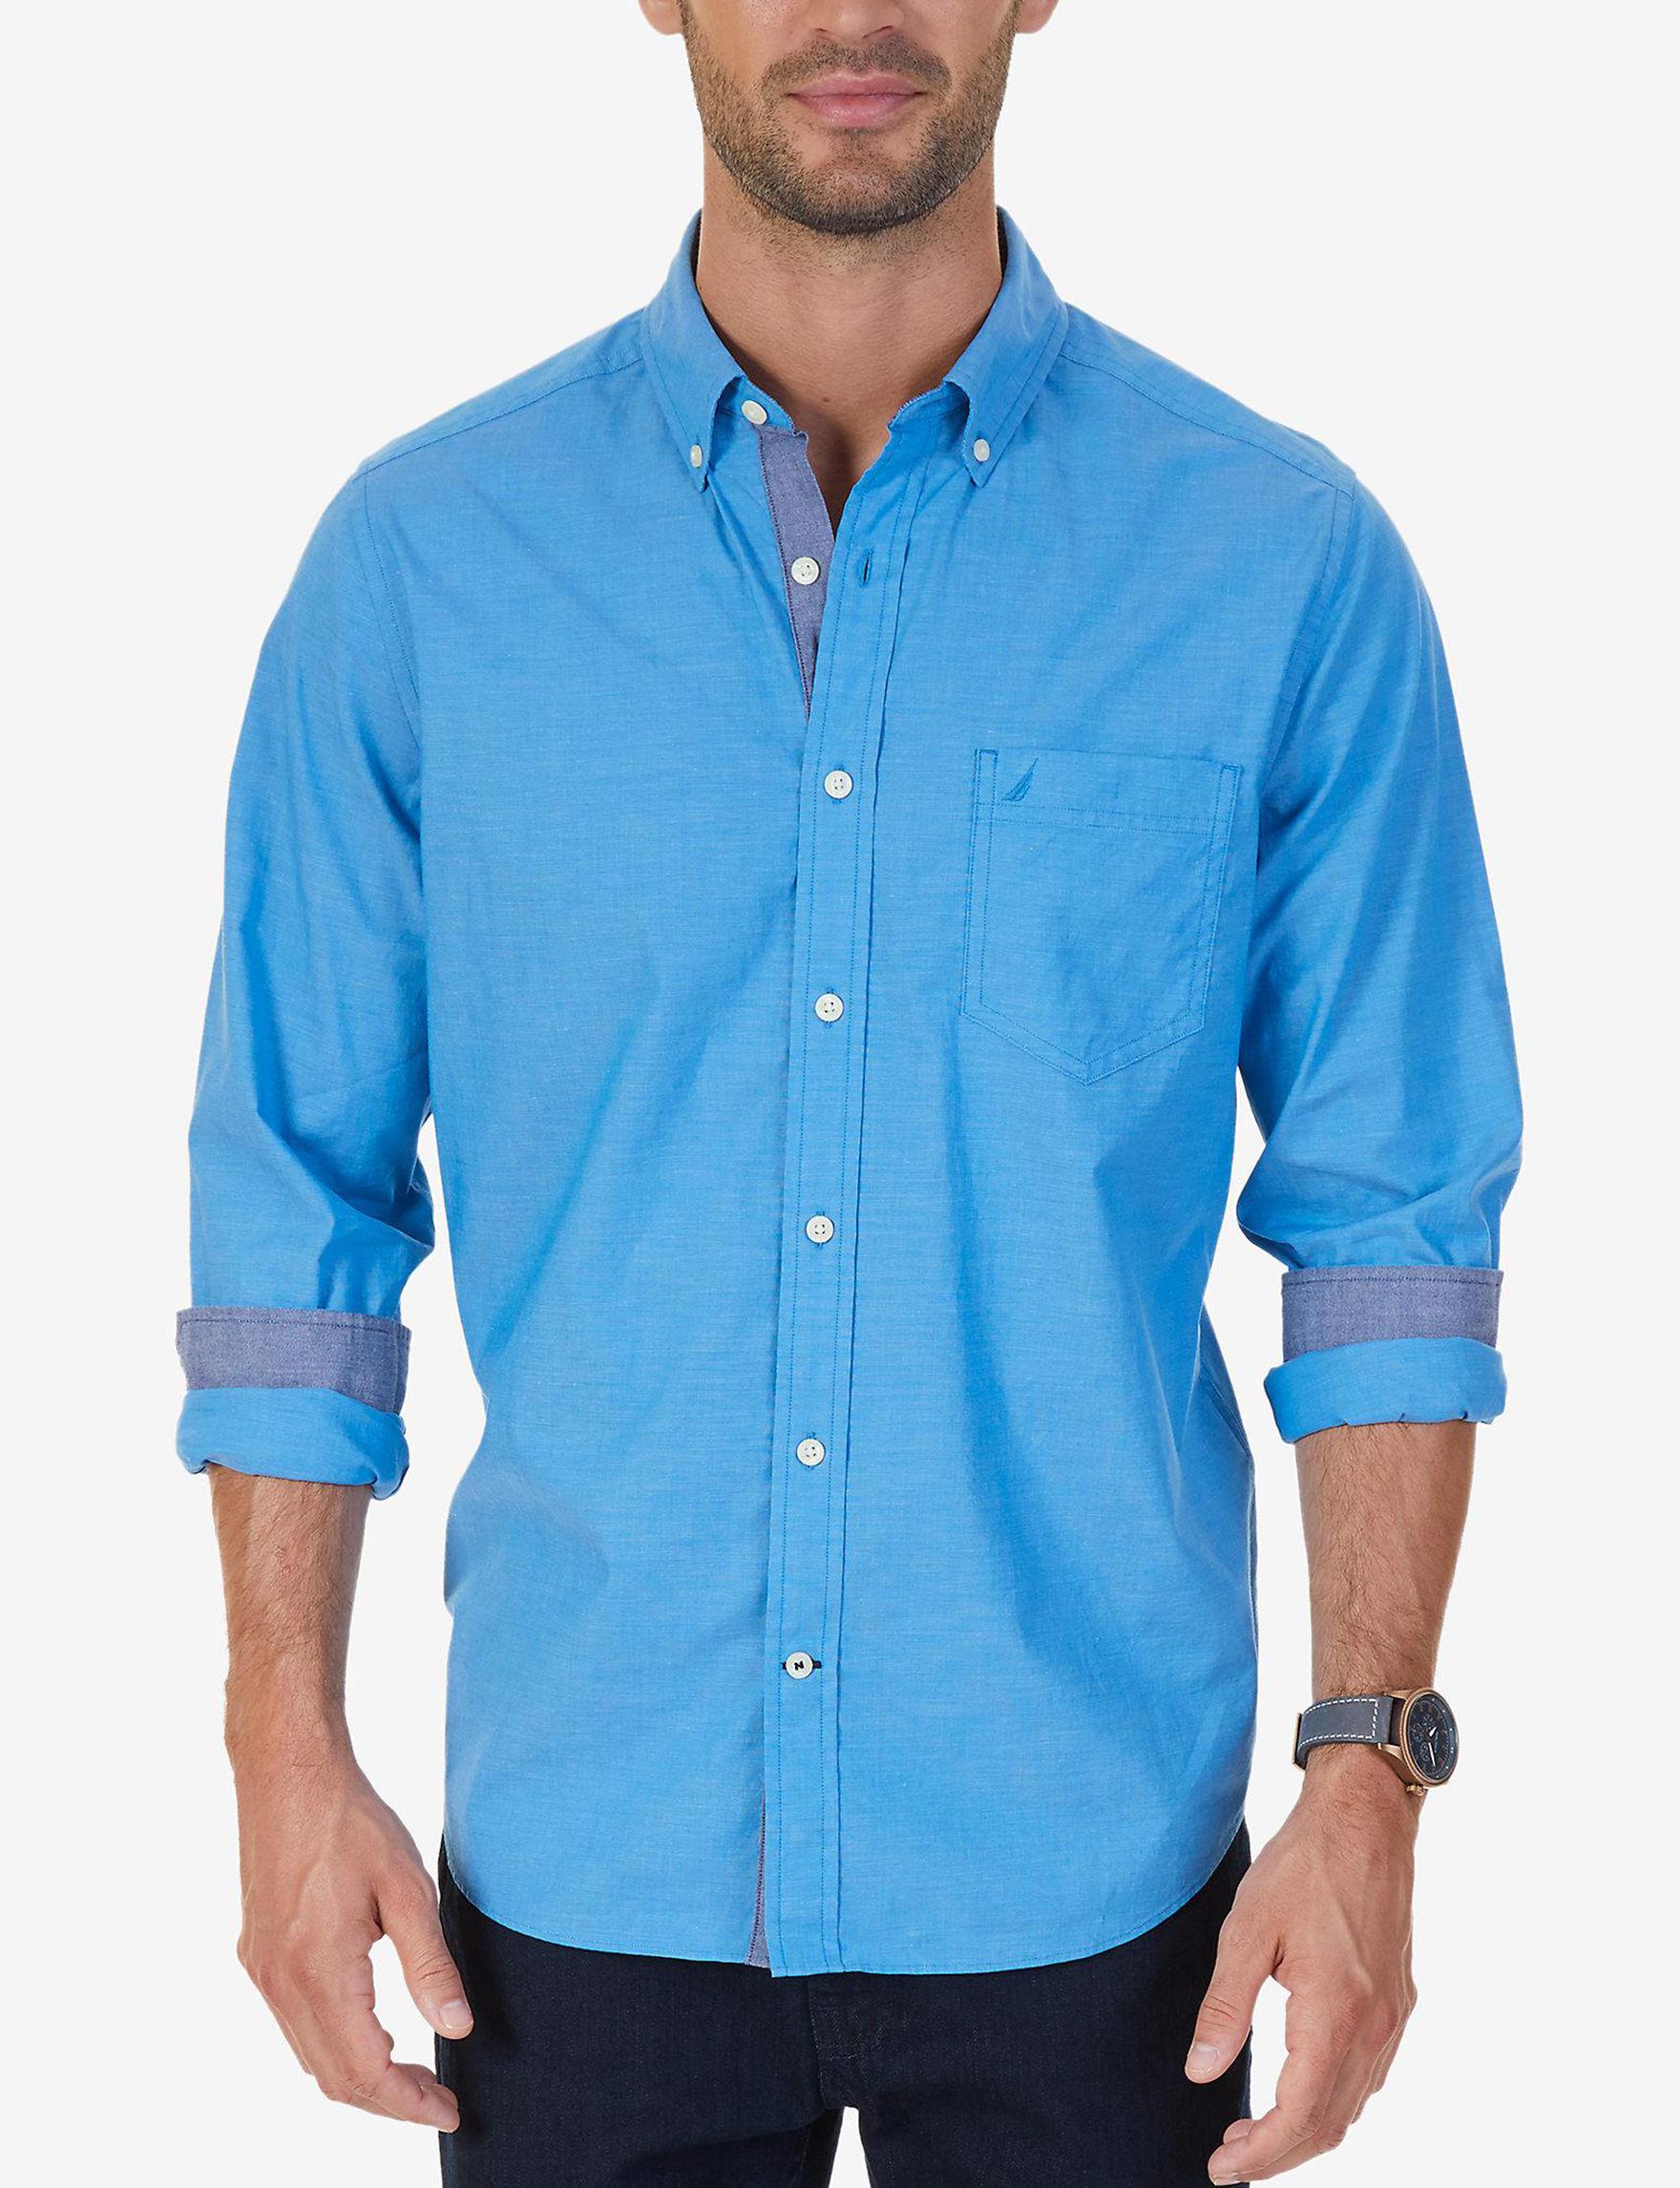 Nautica Blue Casual Button Down Shirts